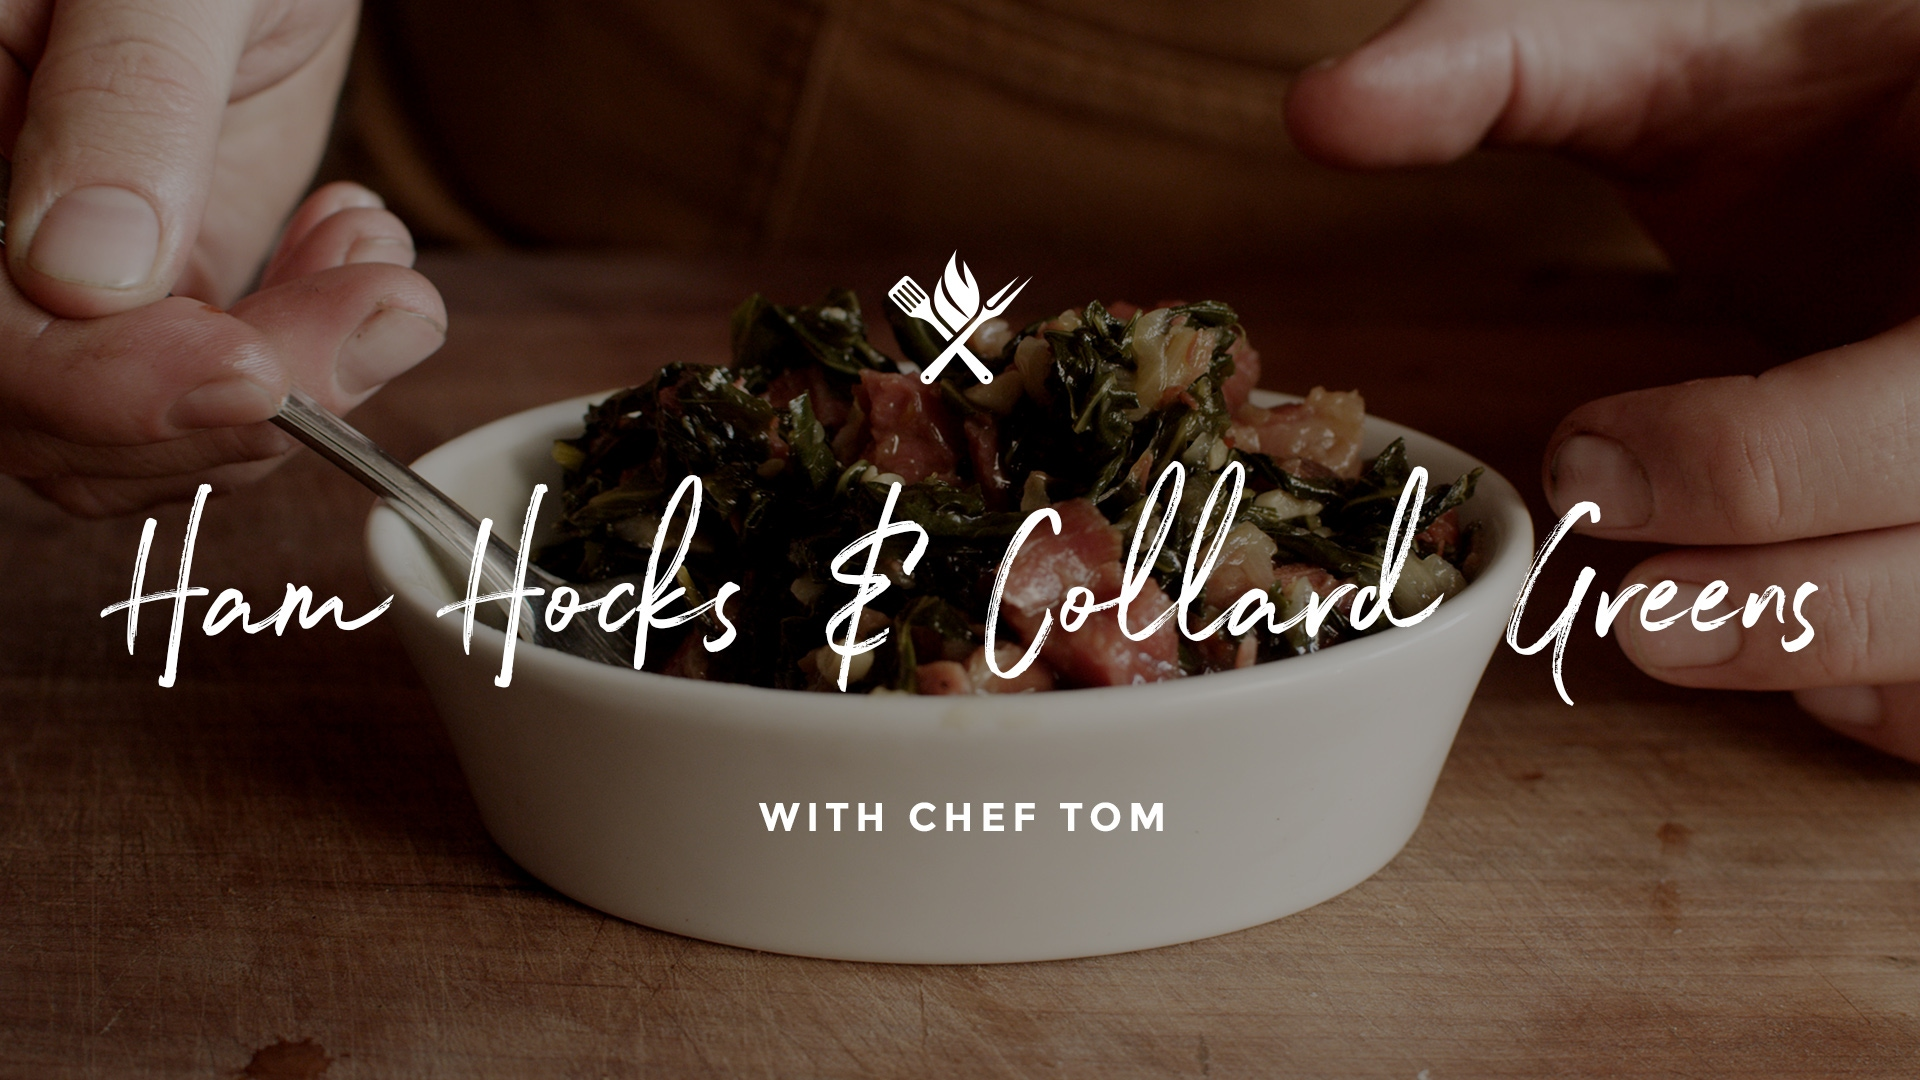 How to make Ham Hocks & Collard Greens